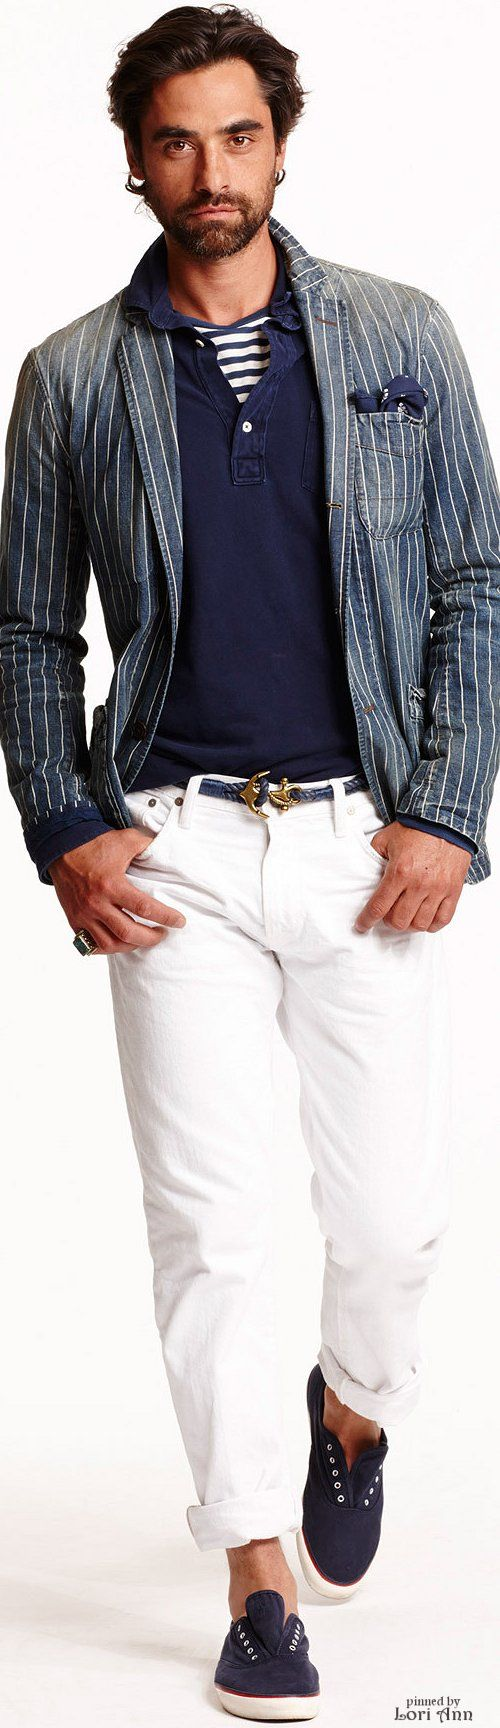 Ralph Lauren Spring 2015 Menswear - modern nautical.